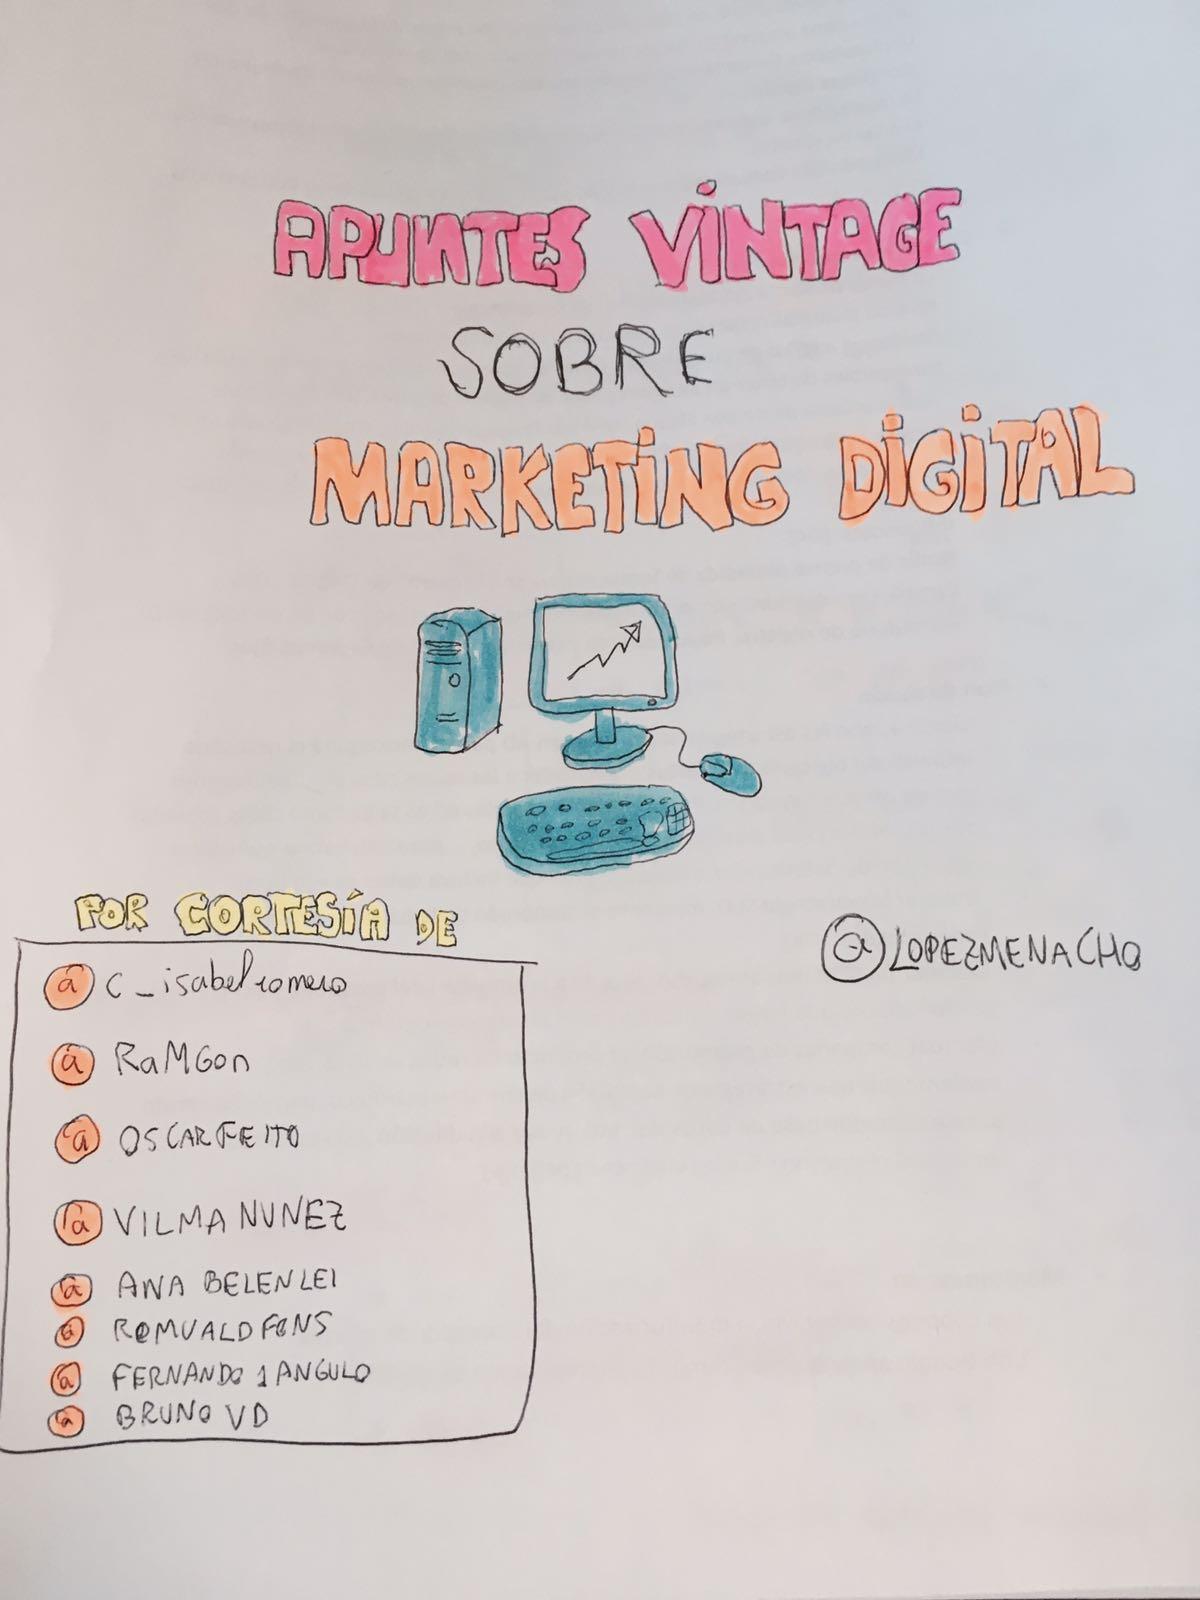 Apuntes vintage sobre Marketing Digital